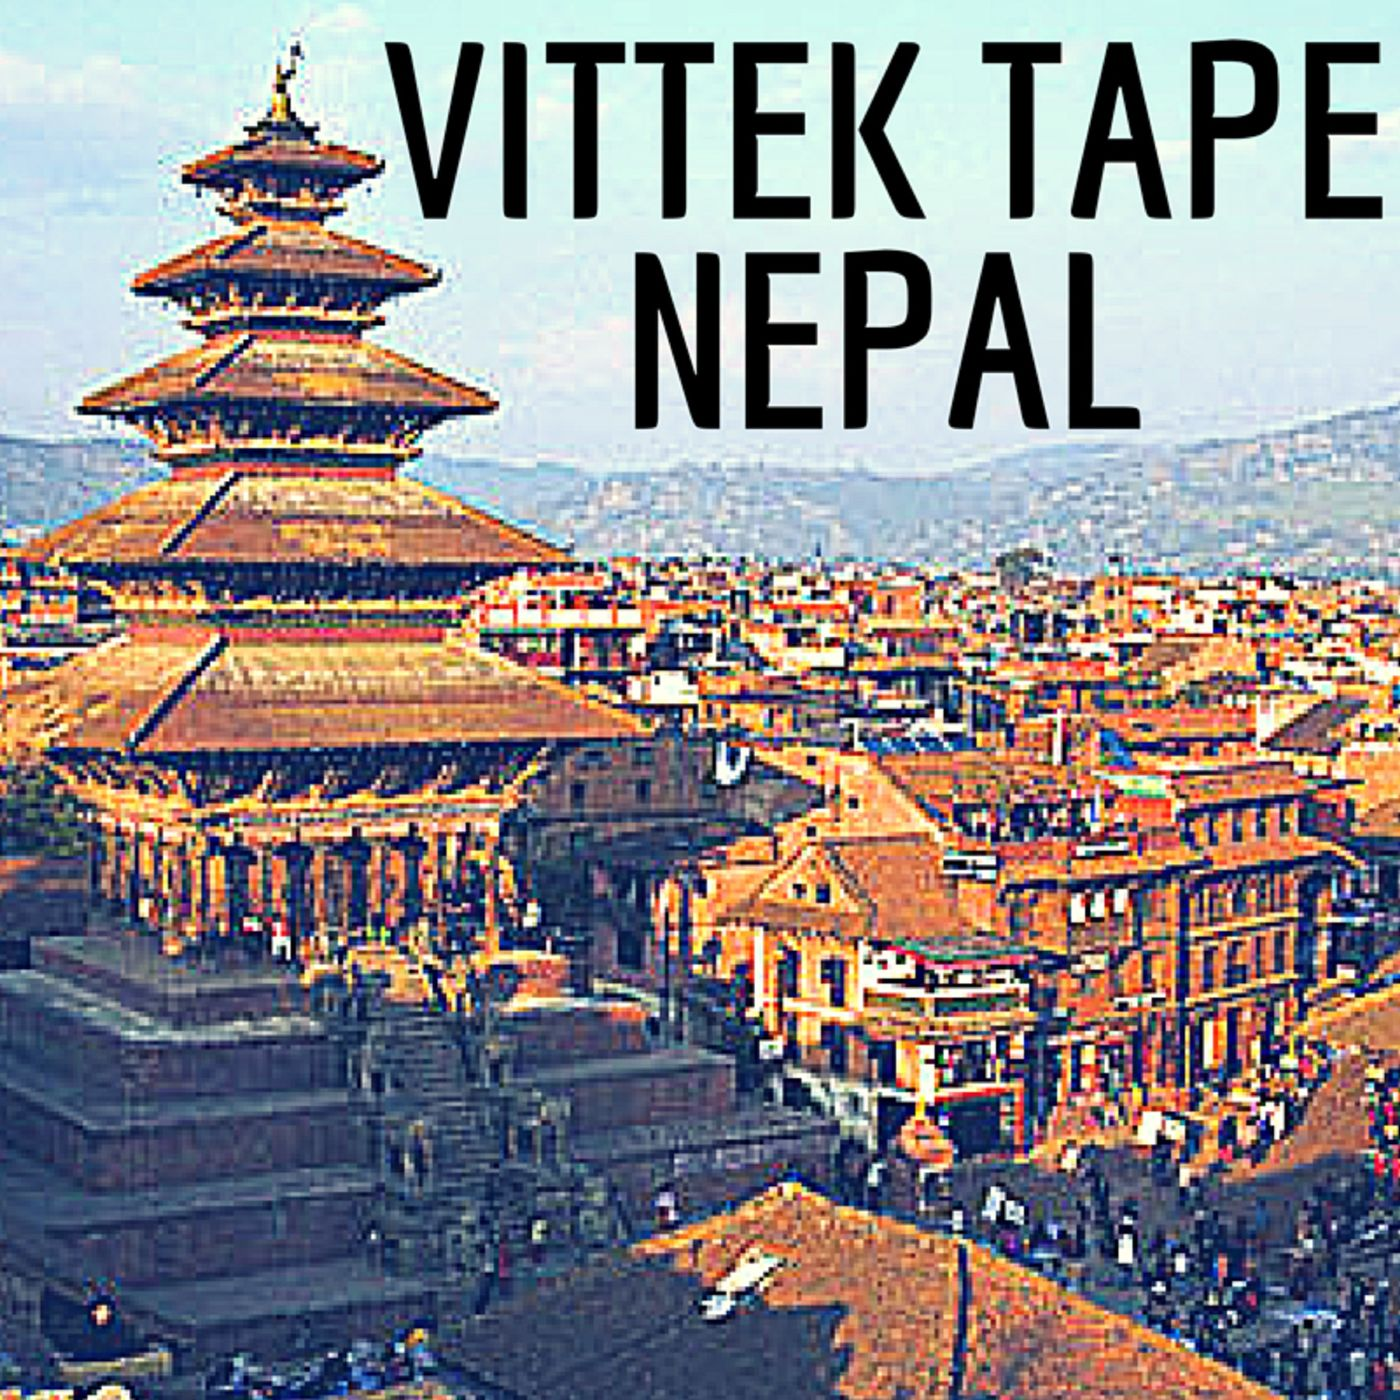 Vittek Tape Nepal